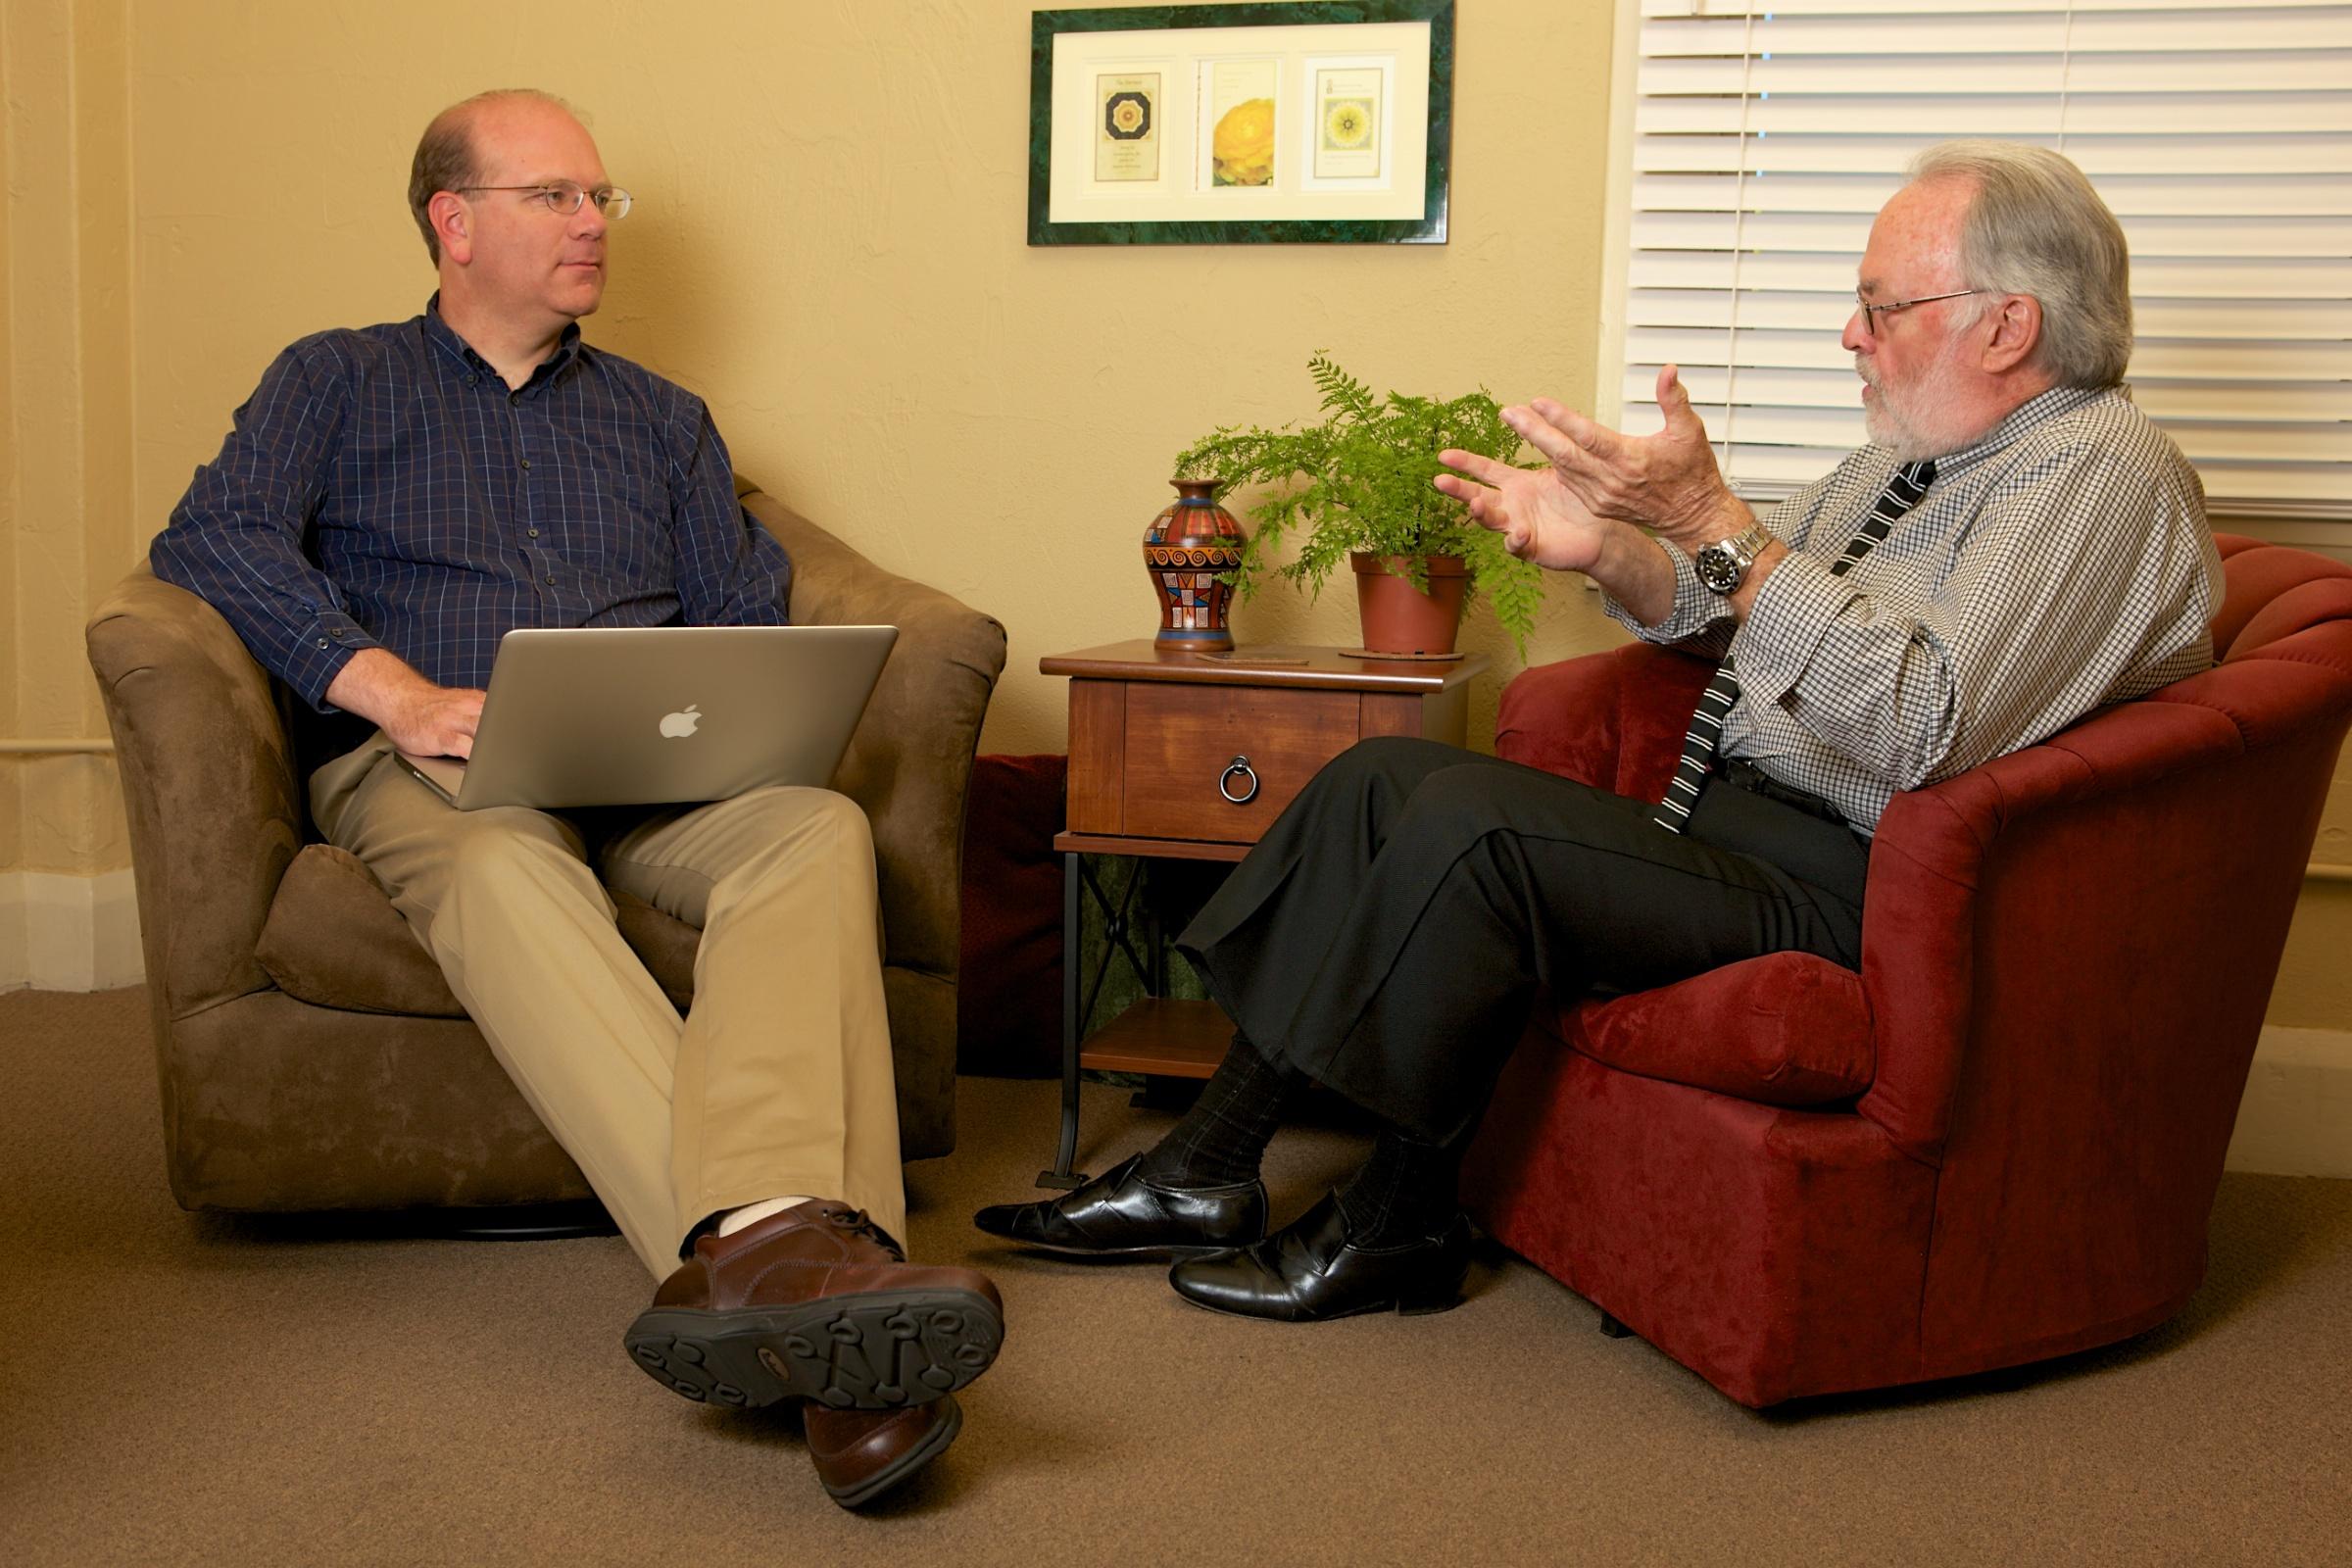 John interviewing an older adult male.